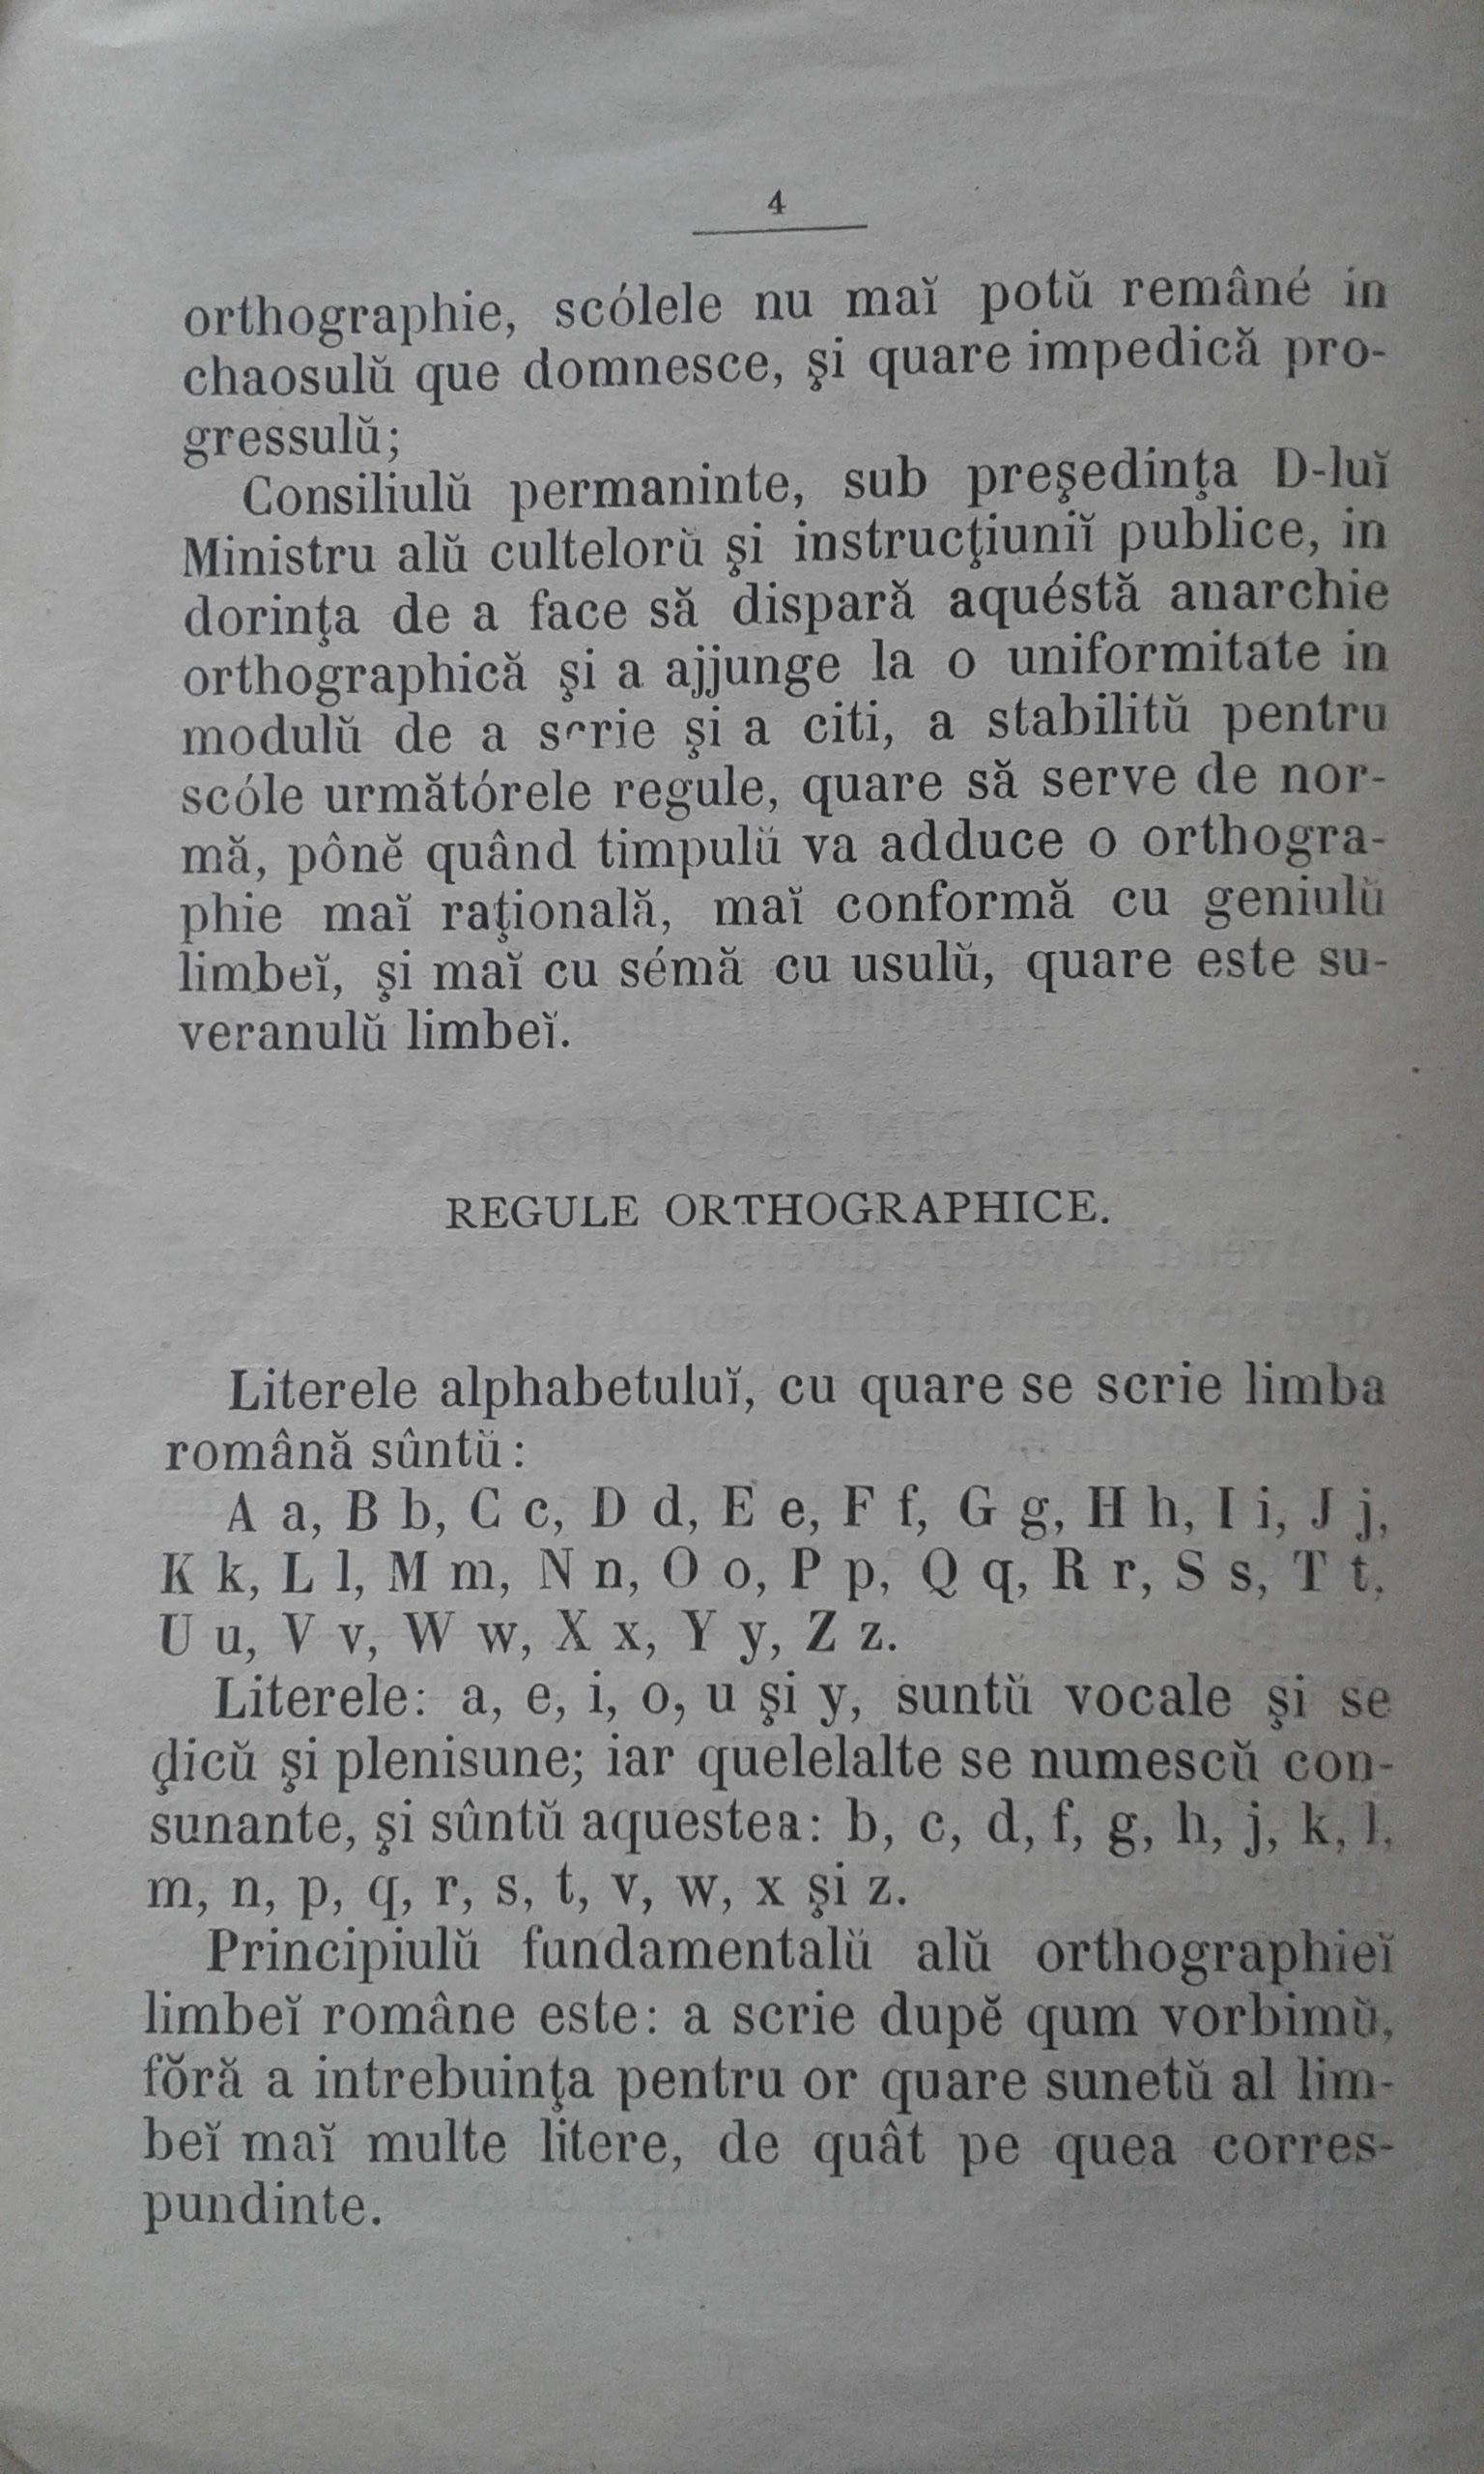 Regule ortografice 1871 (3).jpg